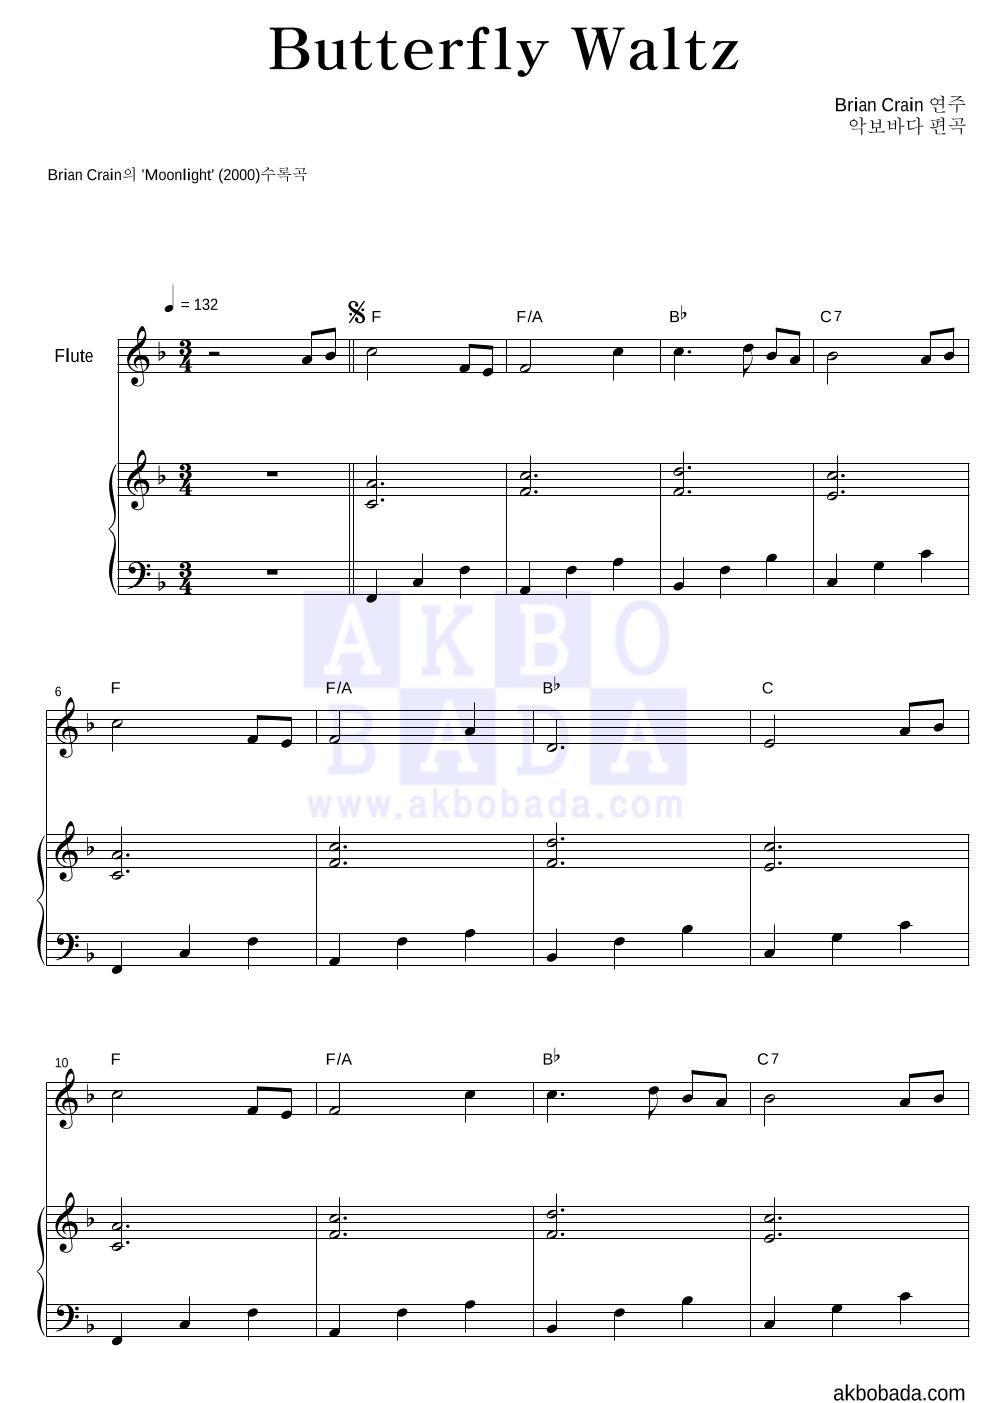 Brian Crain - Butterfly Waltz 플룻&피아노 악보